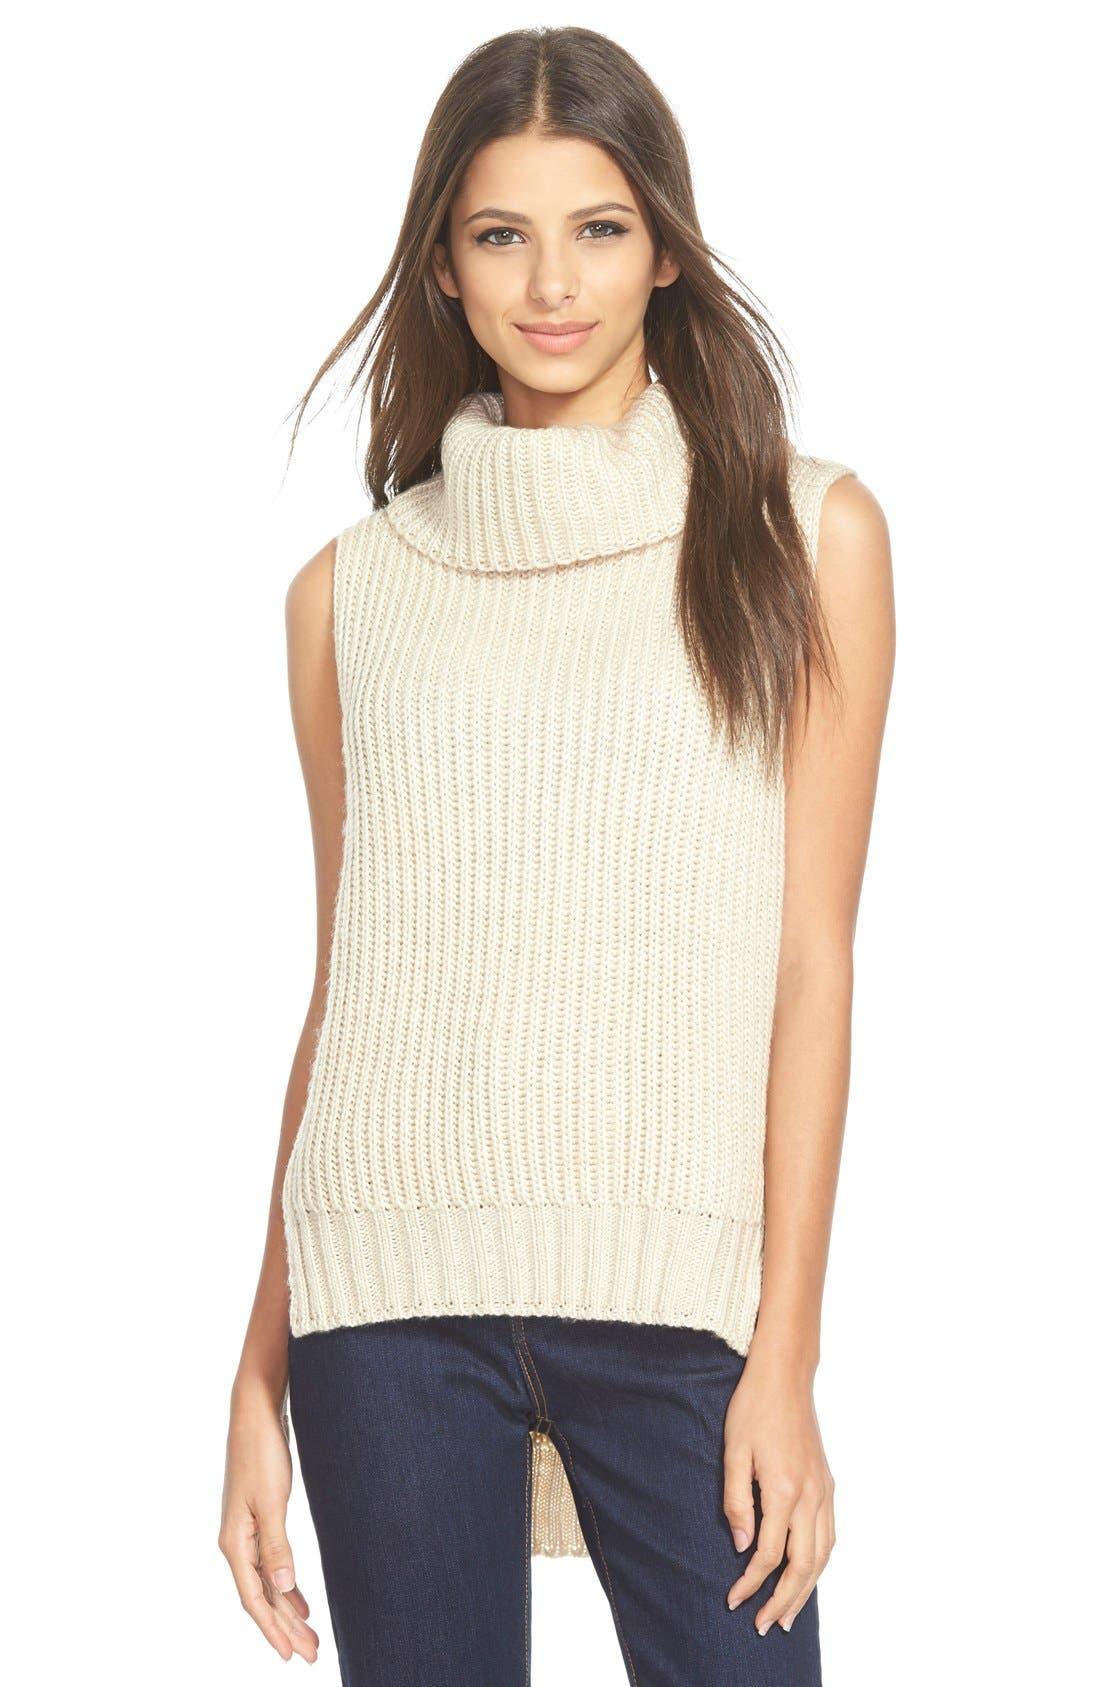 Main Image - ASTR High/Low Turtleneck Sweater